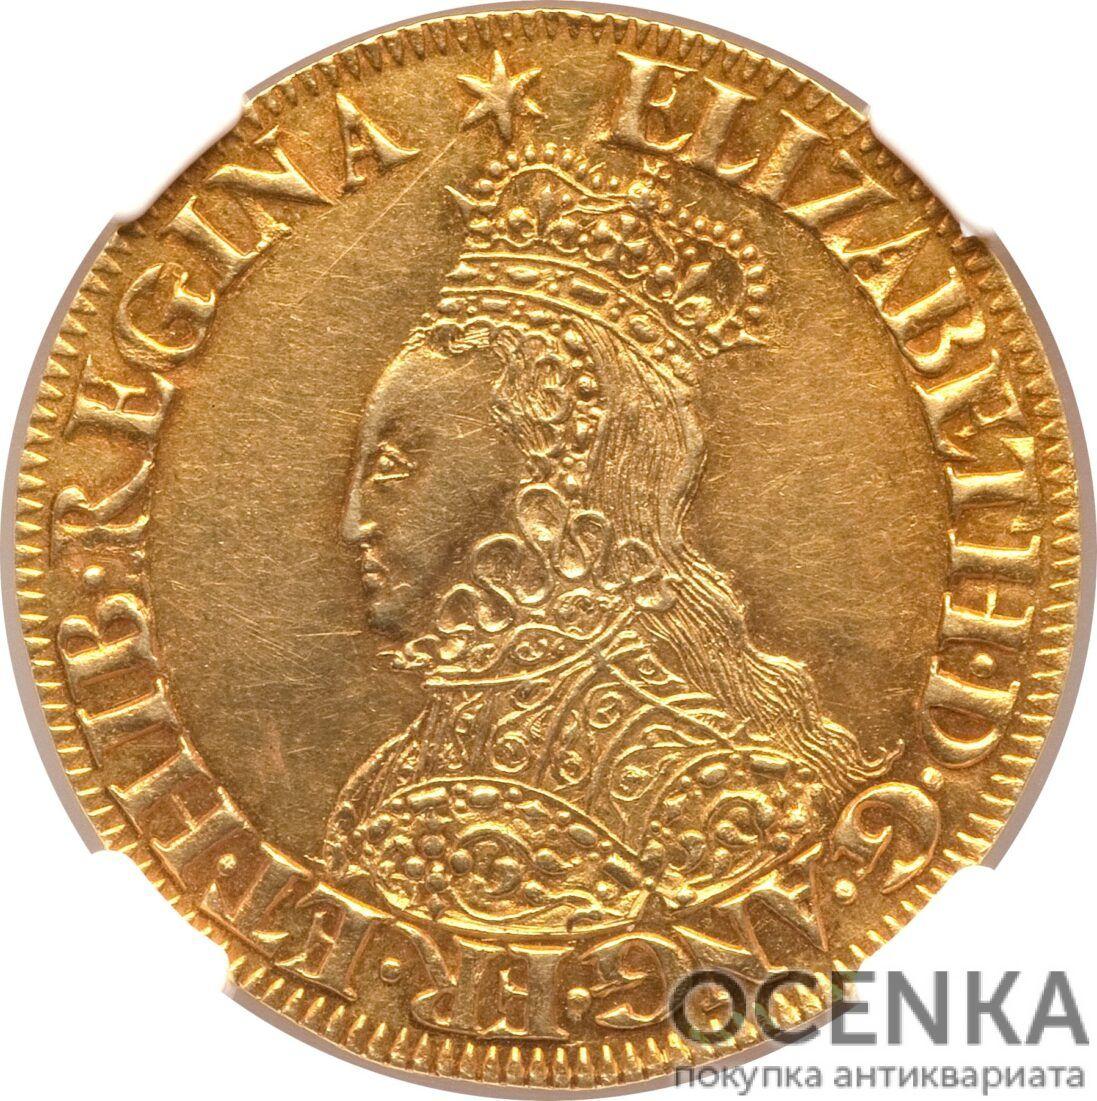 Золотая монета ½ Pound (полфунта) Великобритания